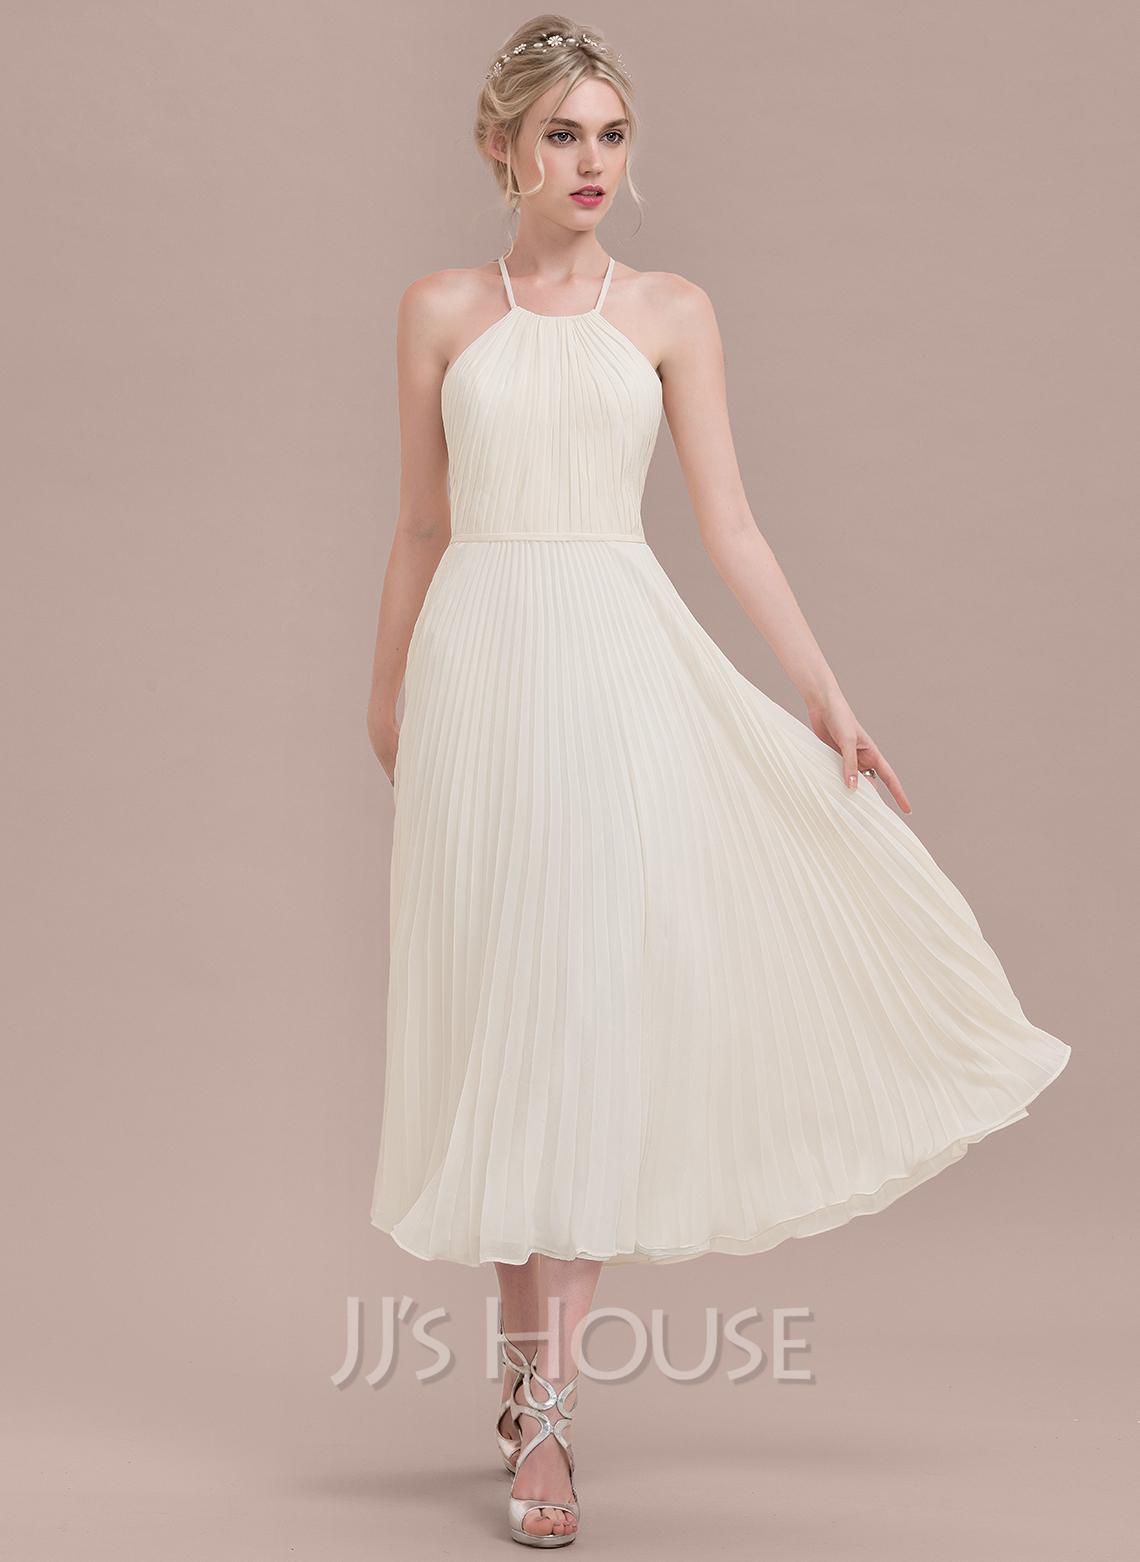 A-Line/Princess Scoop Neck Tea-Length Chiffon Bridesmaid Dress With Pleated